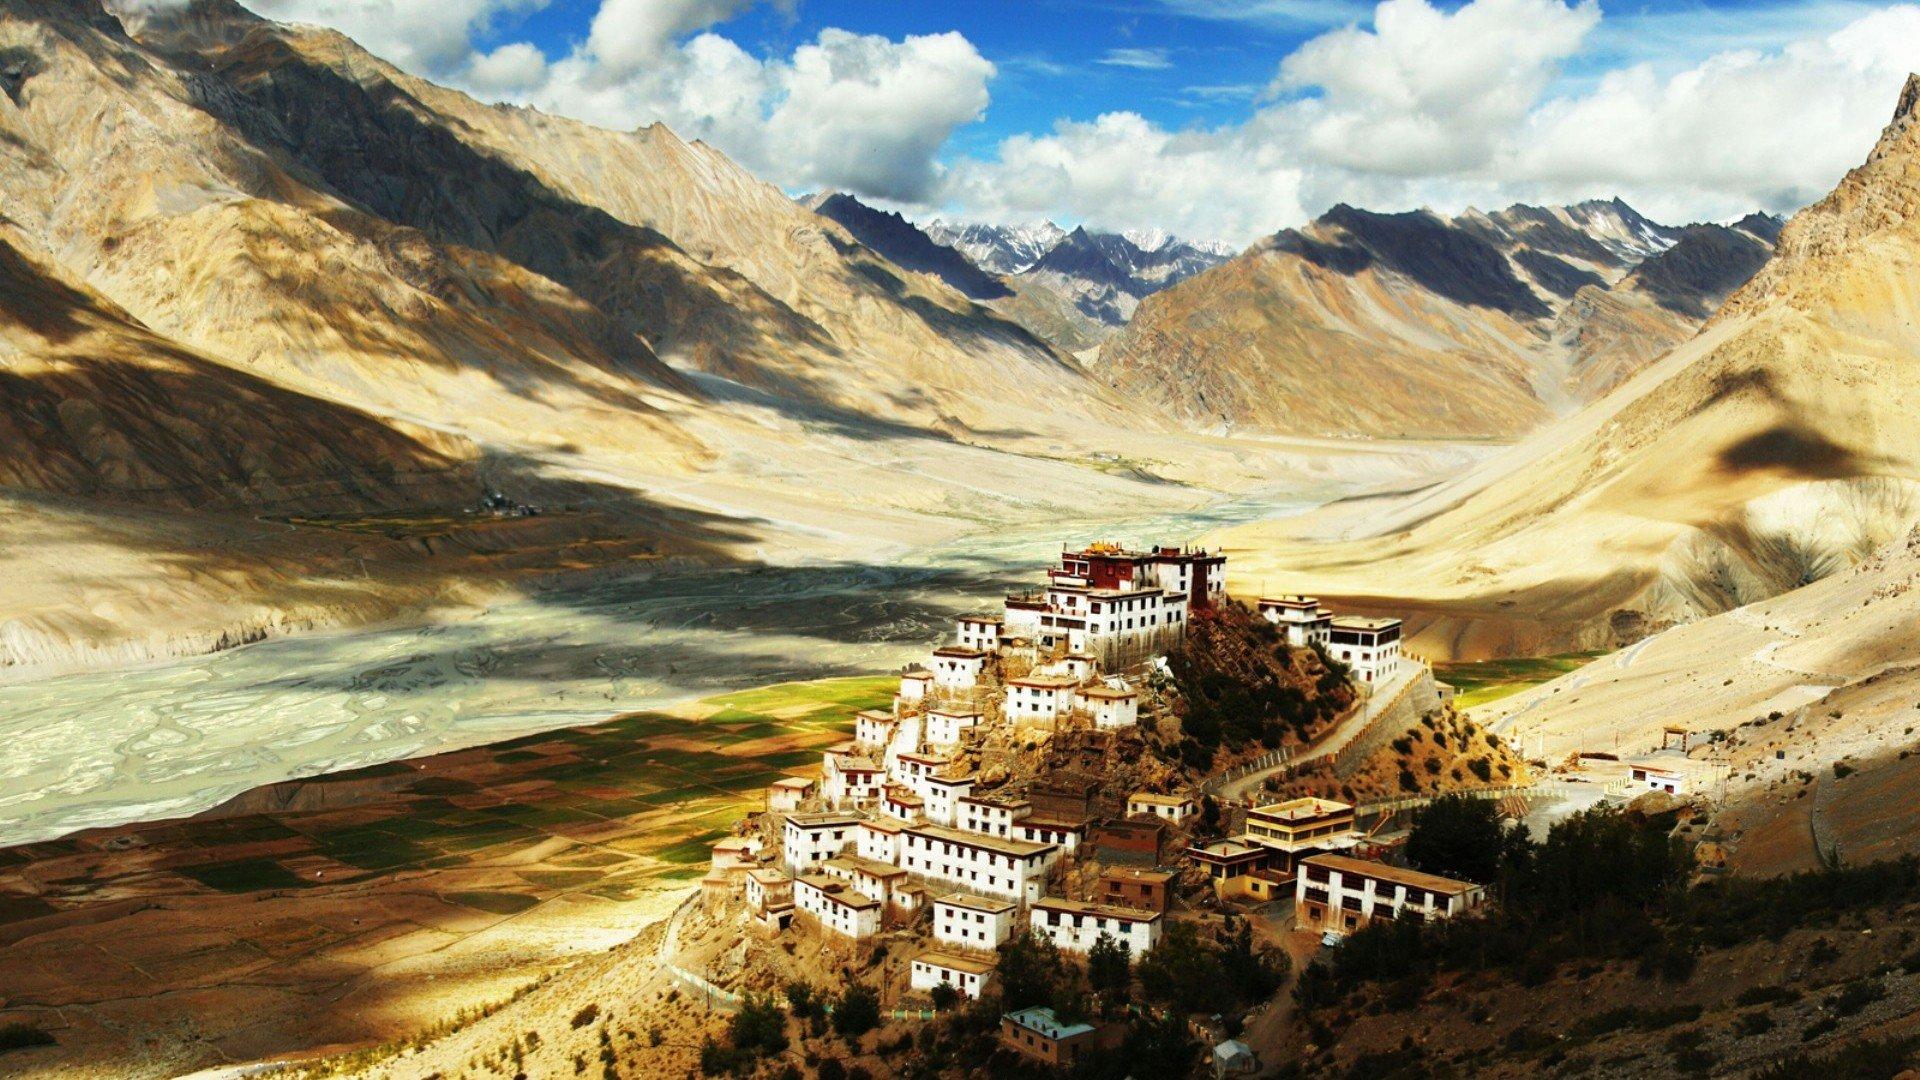 wallpaper : 1920x1080 px, himalayas, monastery, tibet 1920x1080